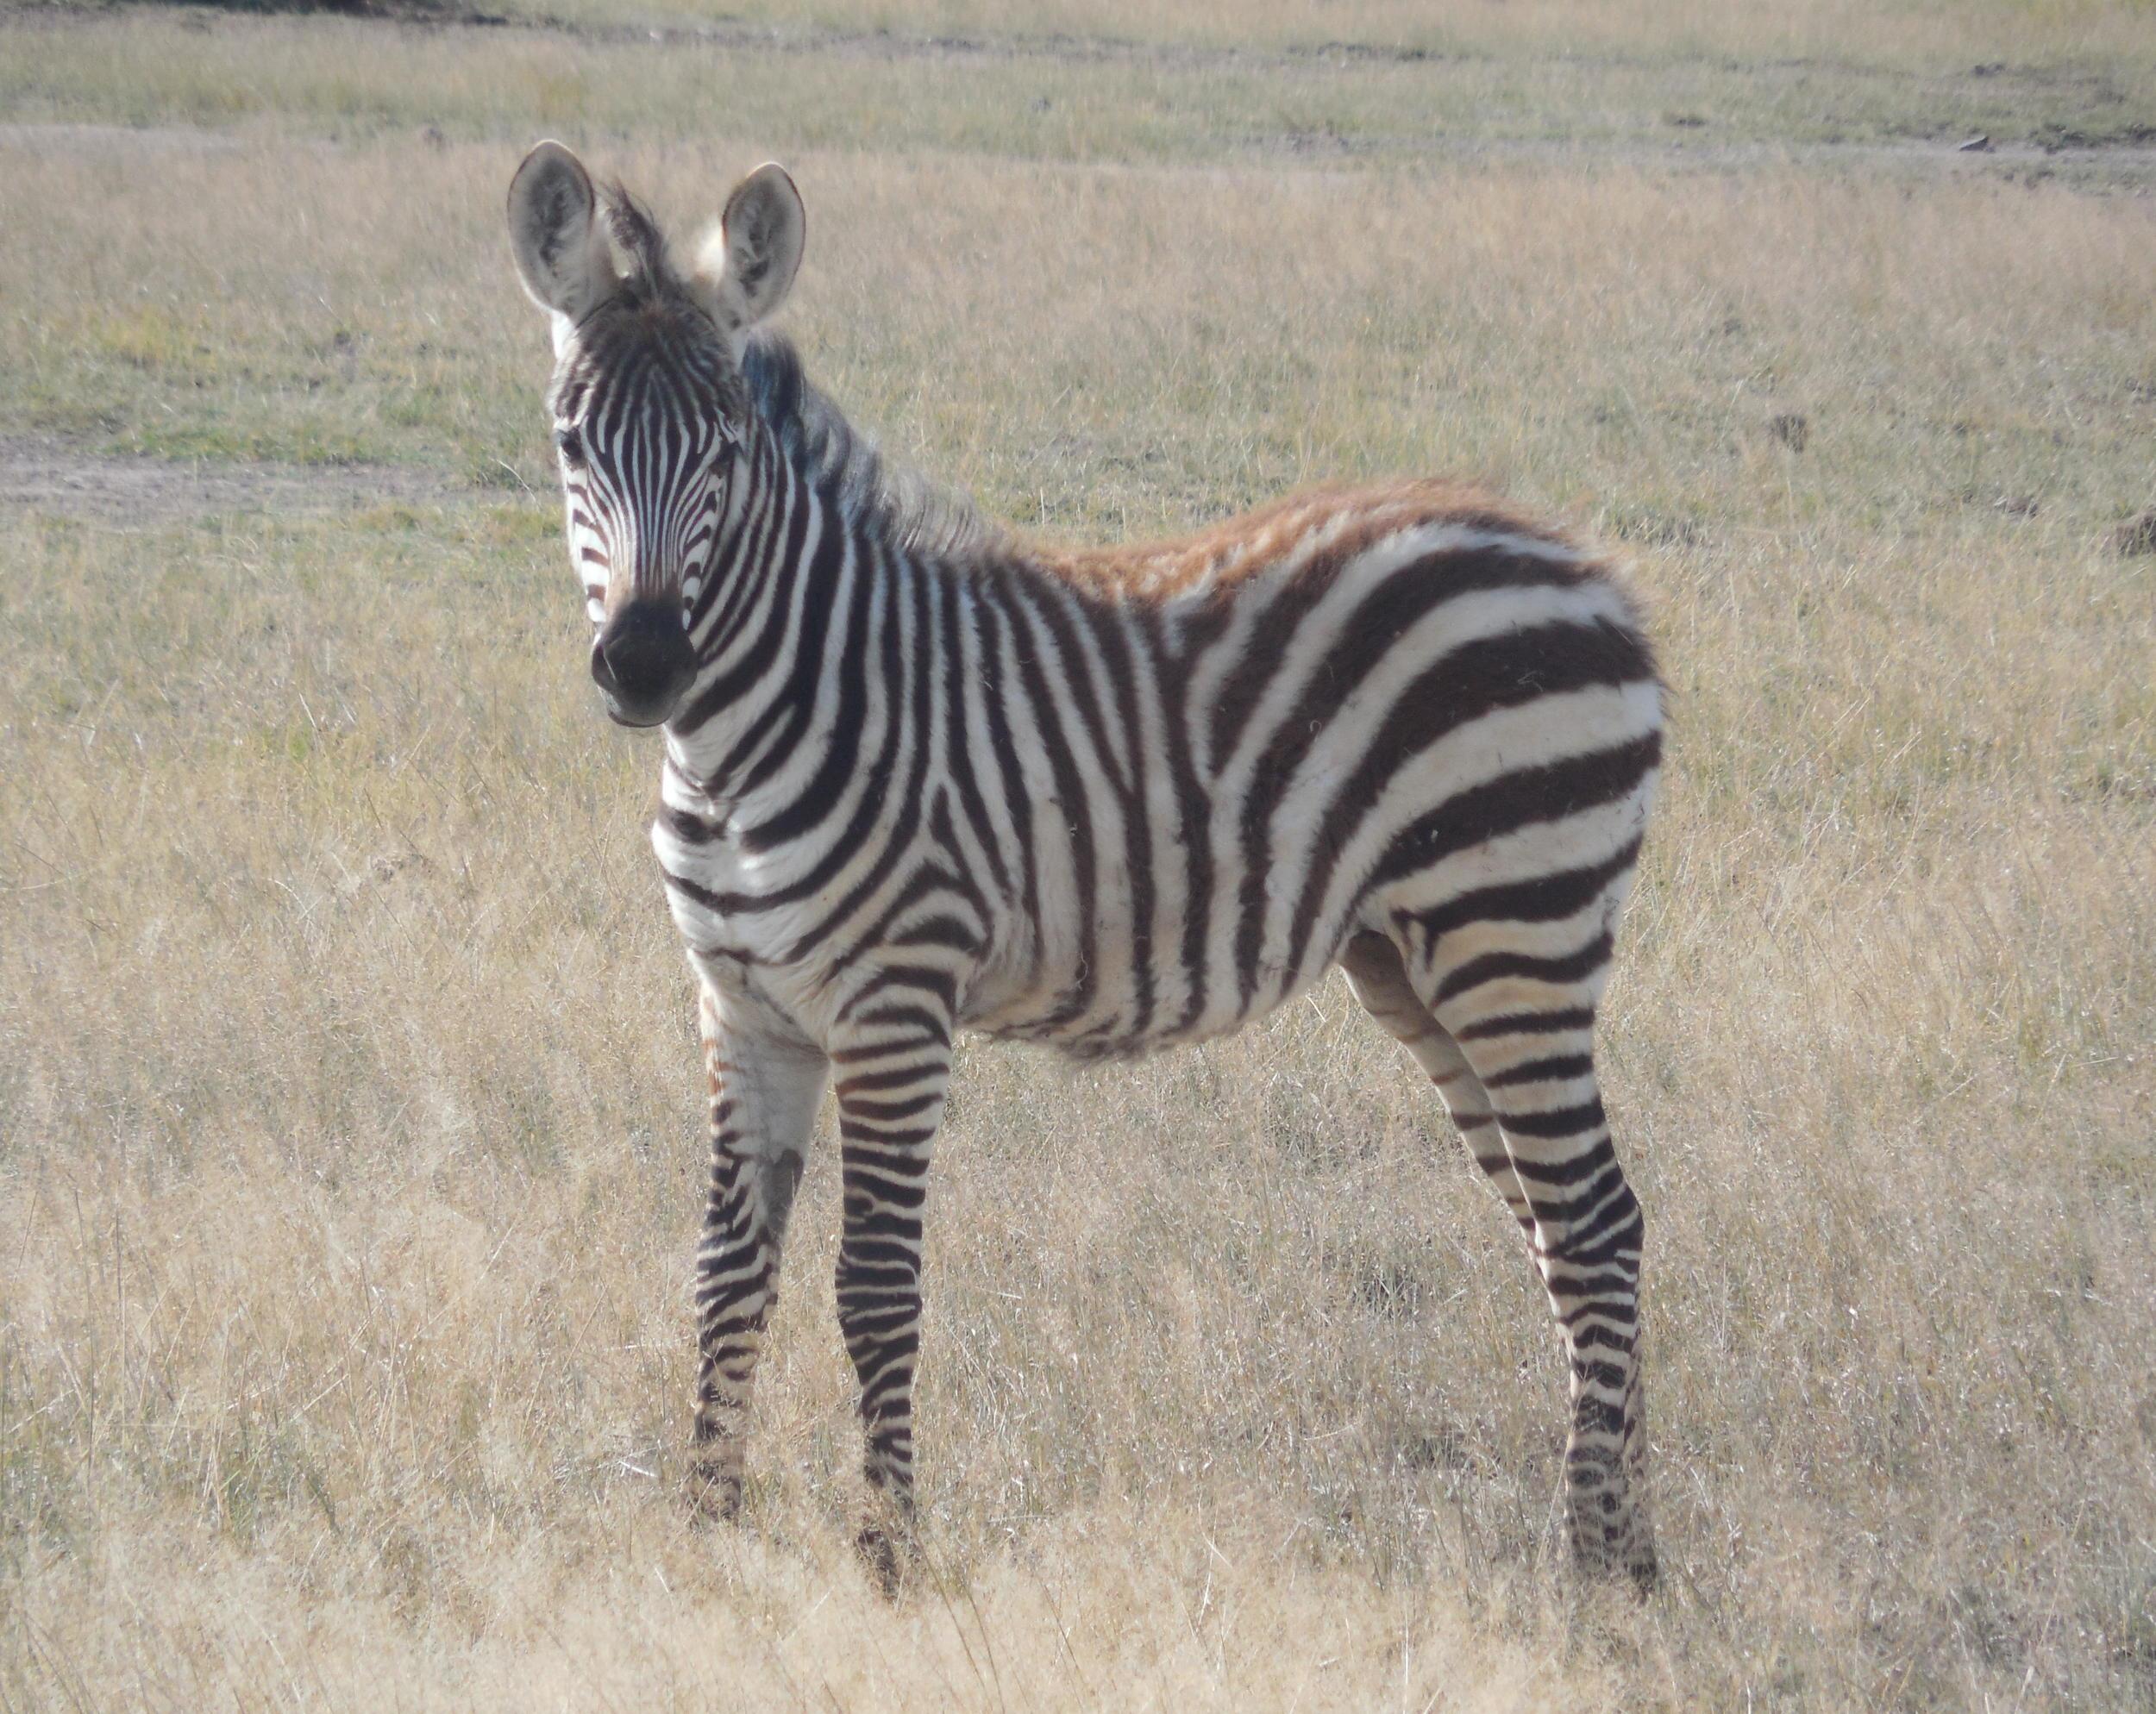 Cute Little Zebra Kenya 2014 © Flyga Twiga LLC